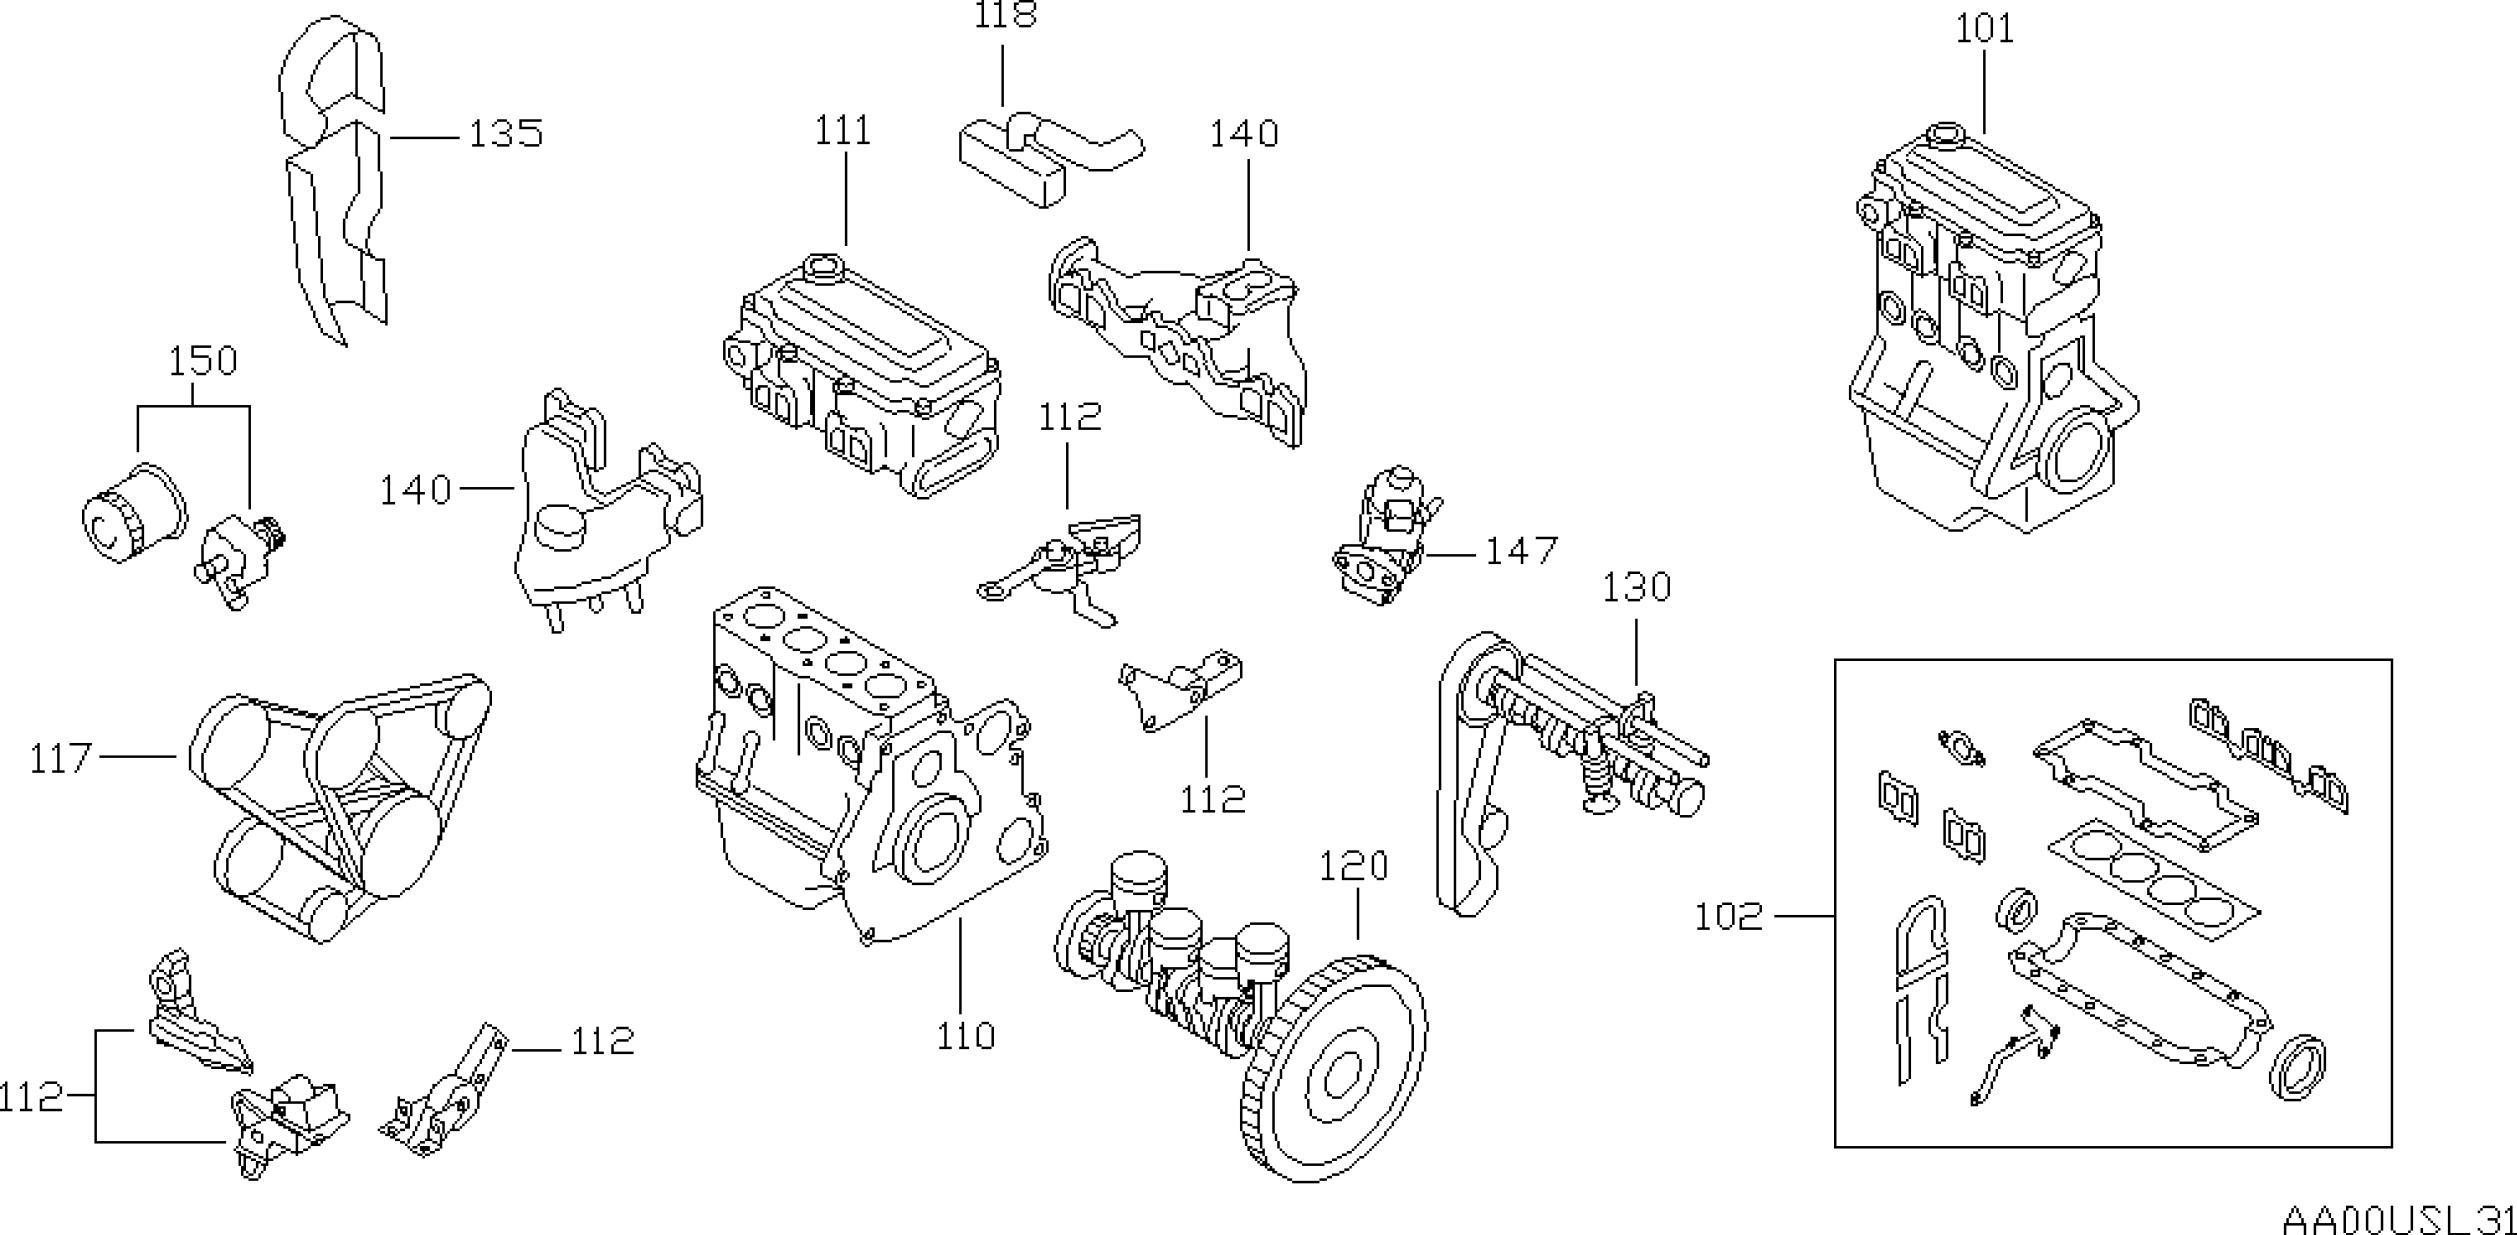 2005 Nissan Altima Motor Diagrams Electrical Wiring Engine Diagram 2003 2010 Car Steering